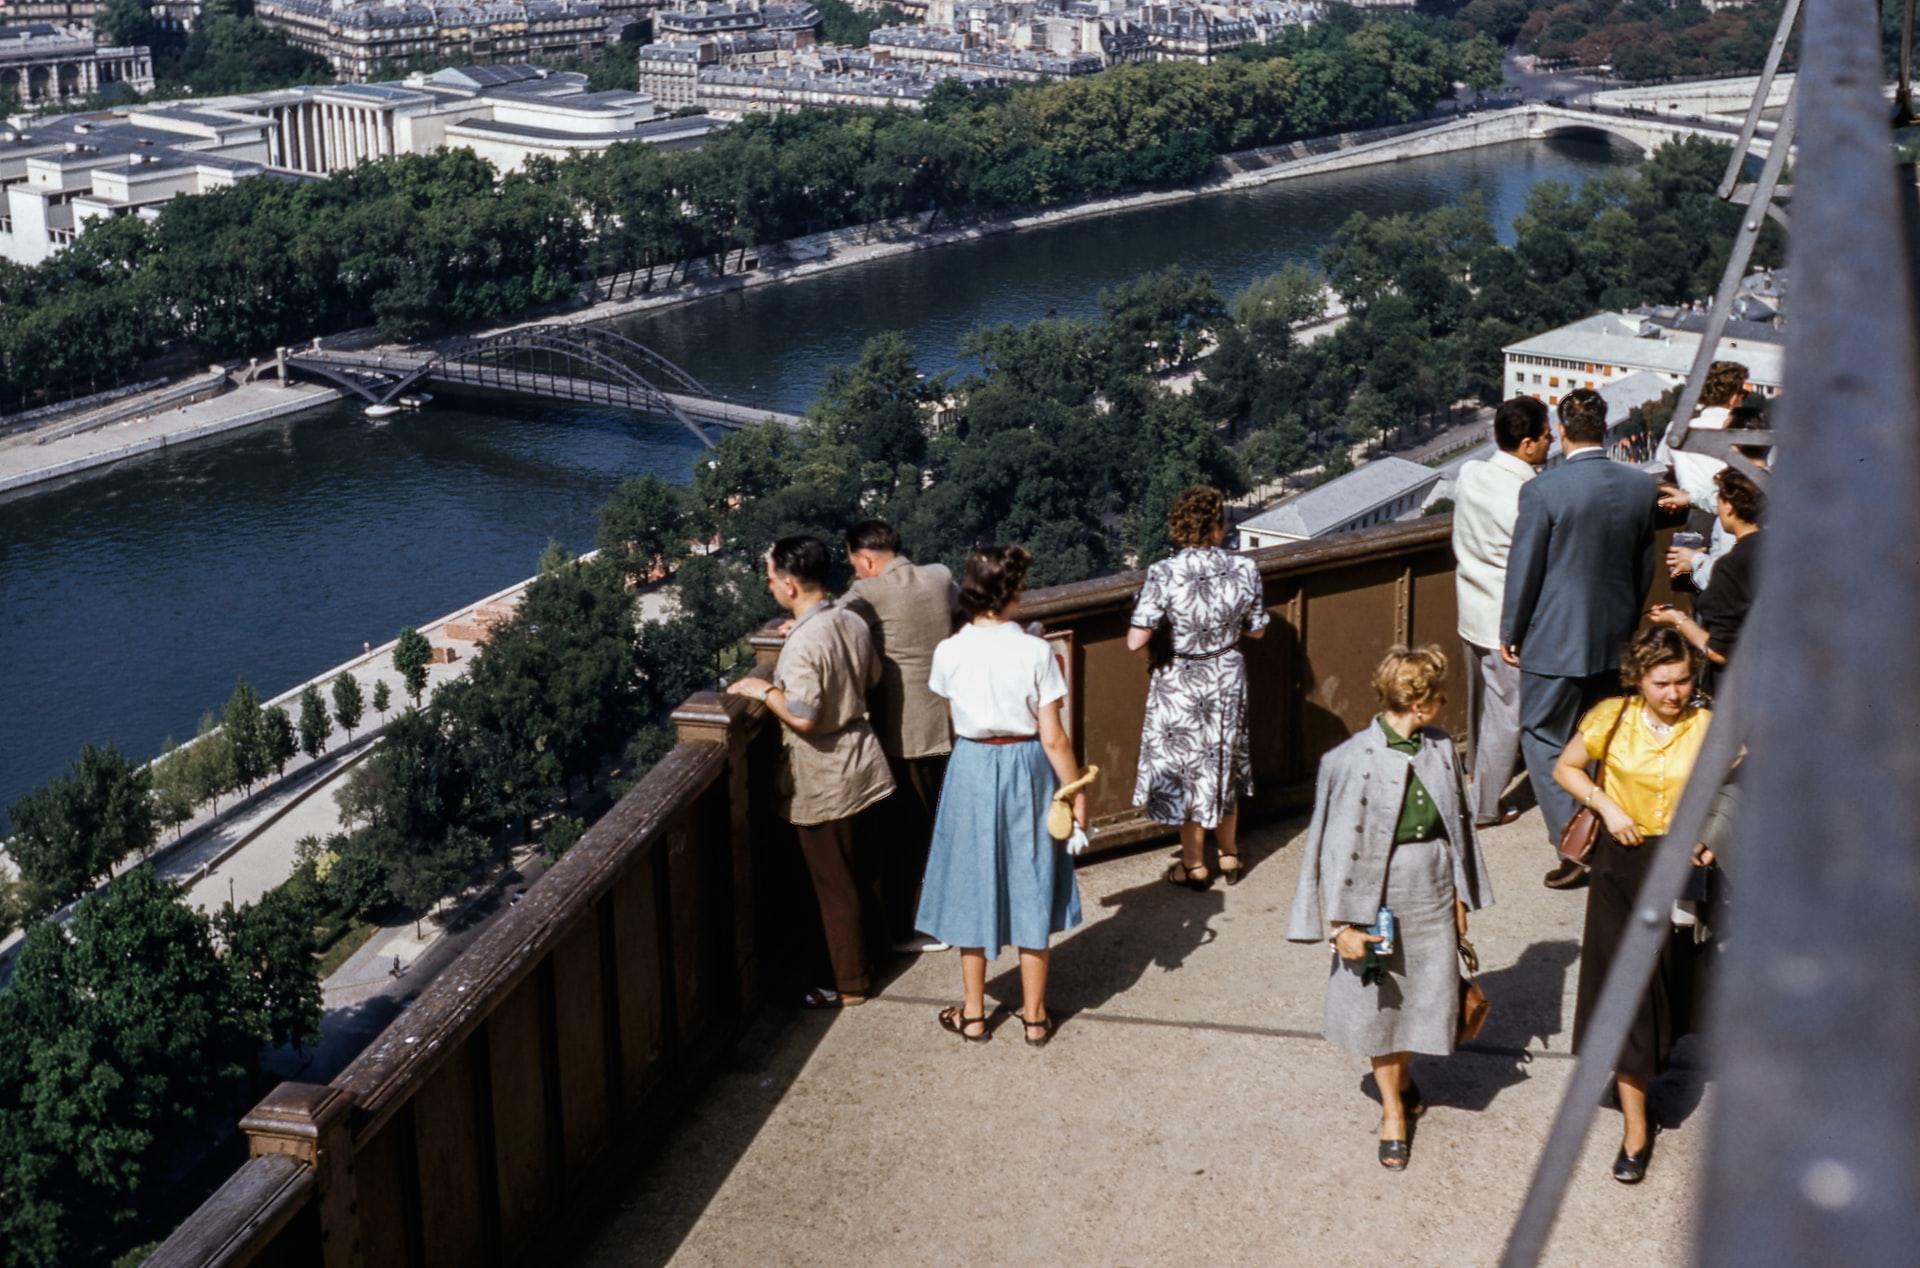 Historic photo of Eiffel Tower platform